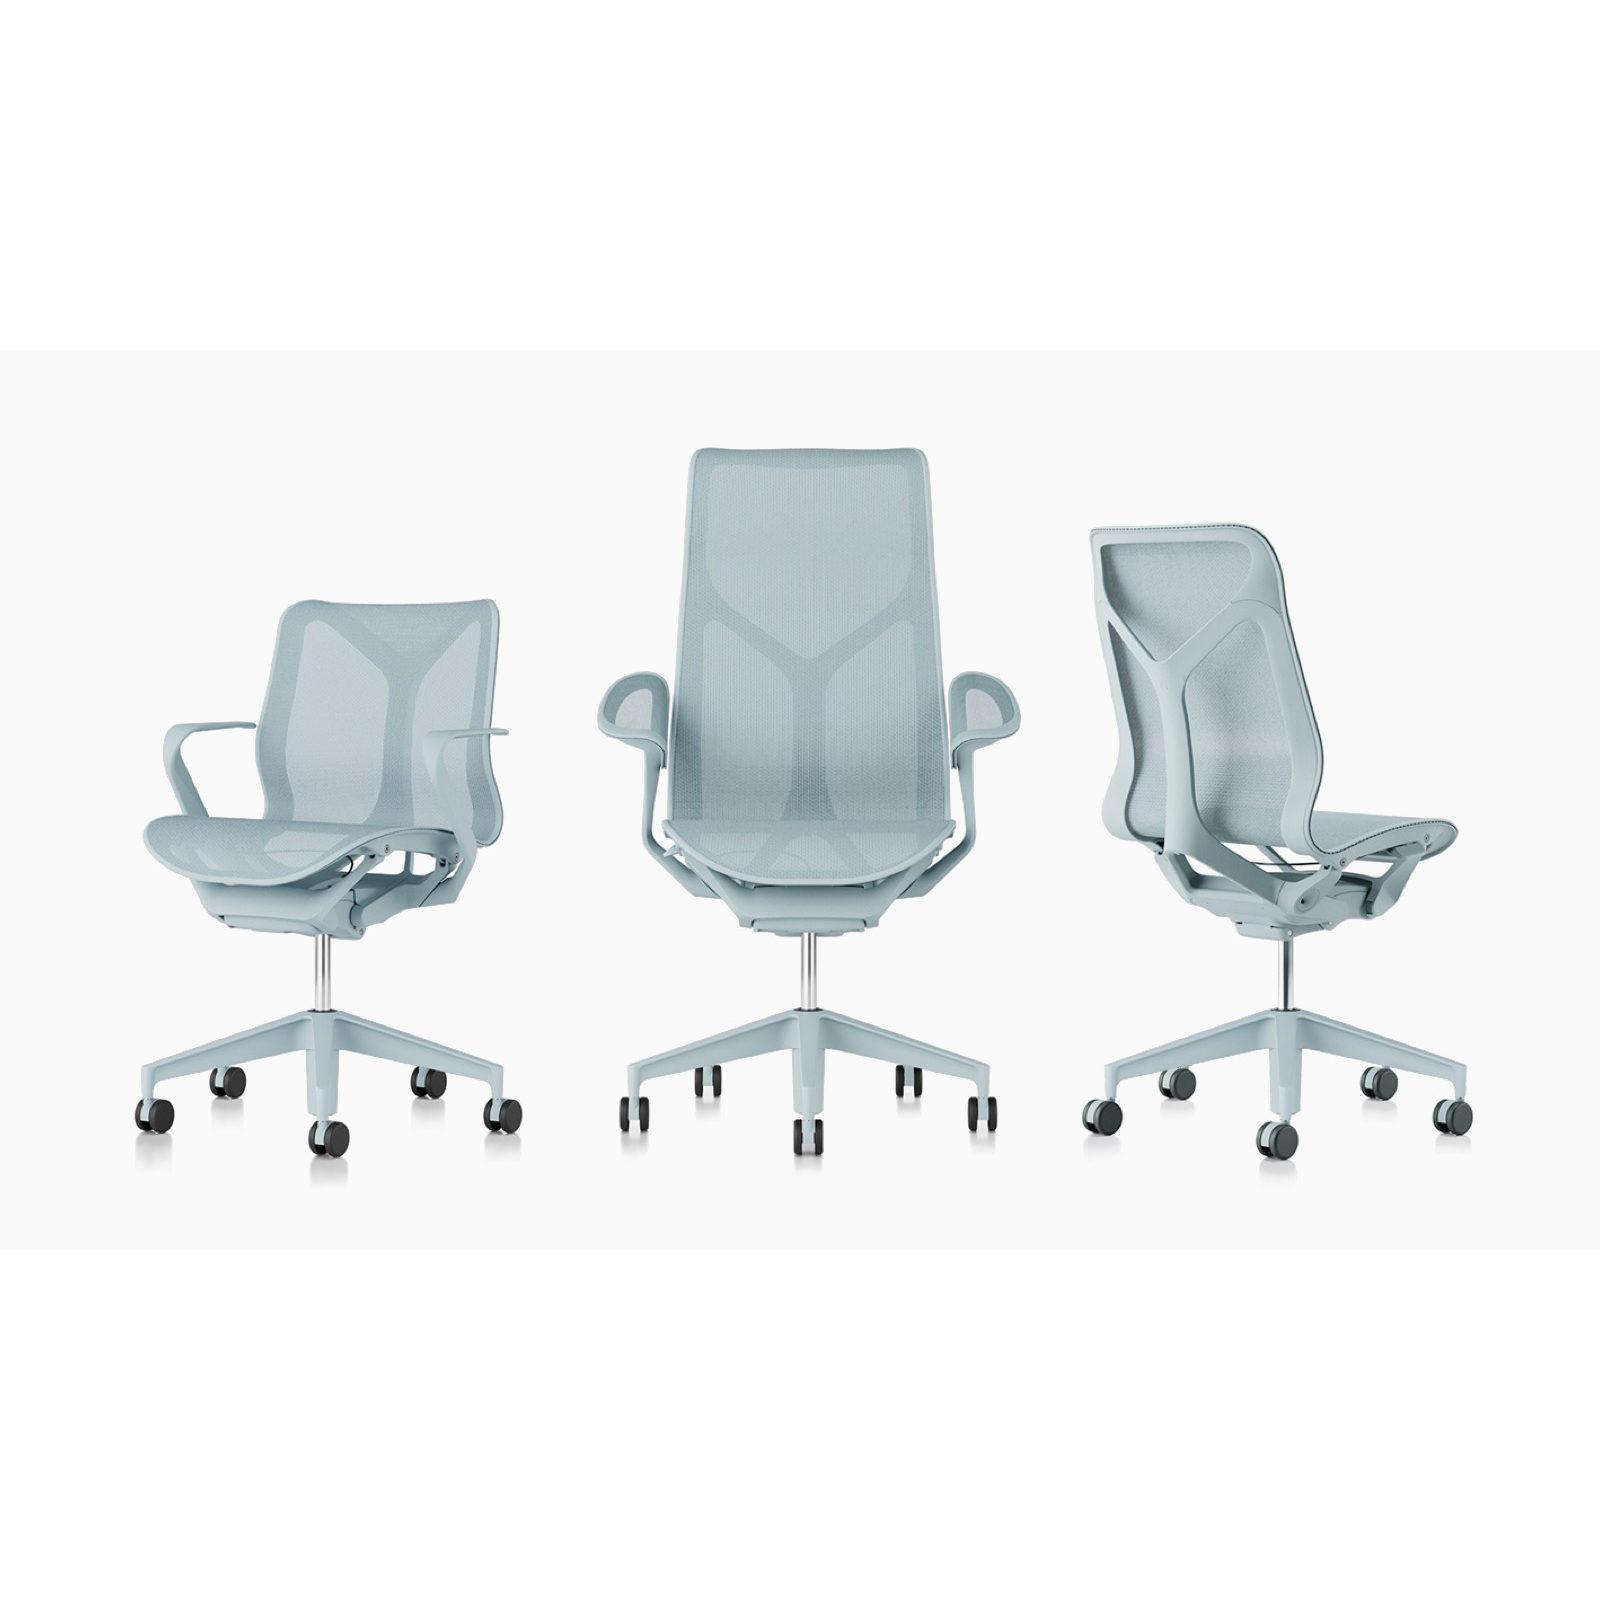 Cosm chairs glacier